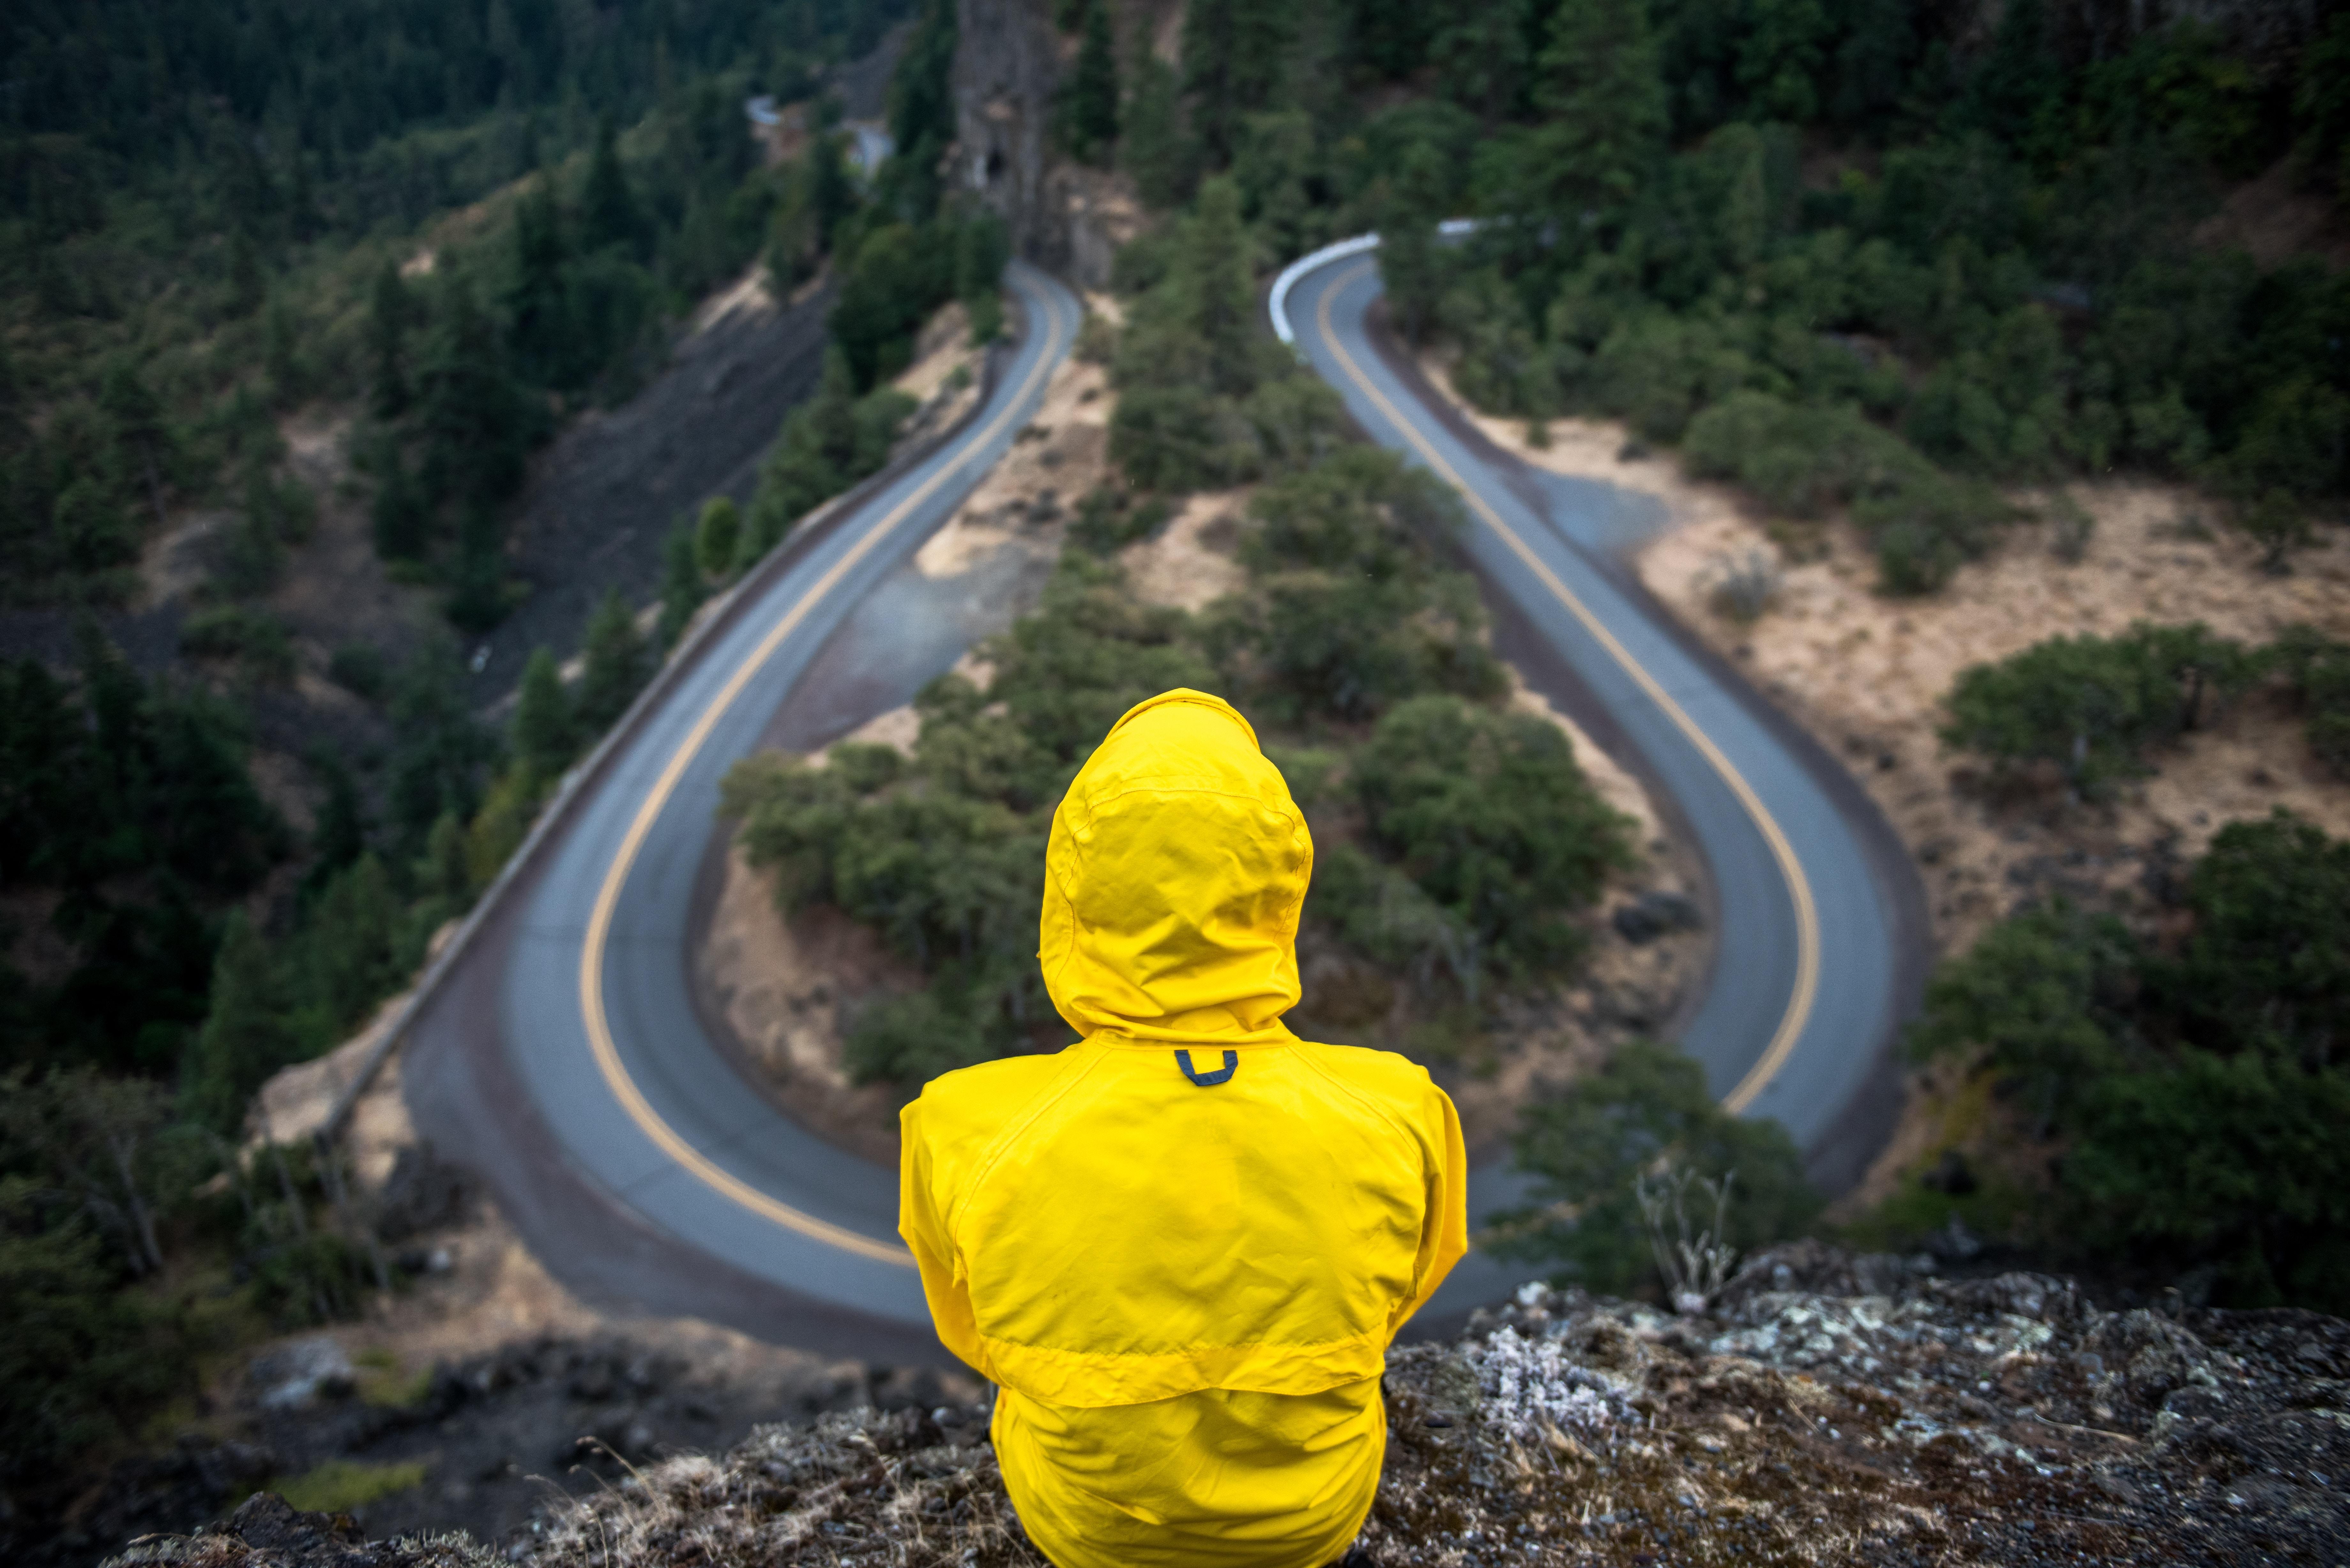 Photograph of a man at a crossroads